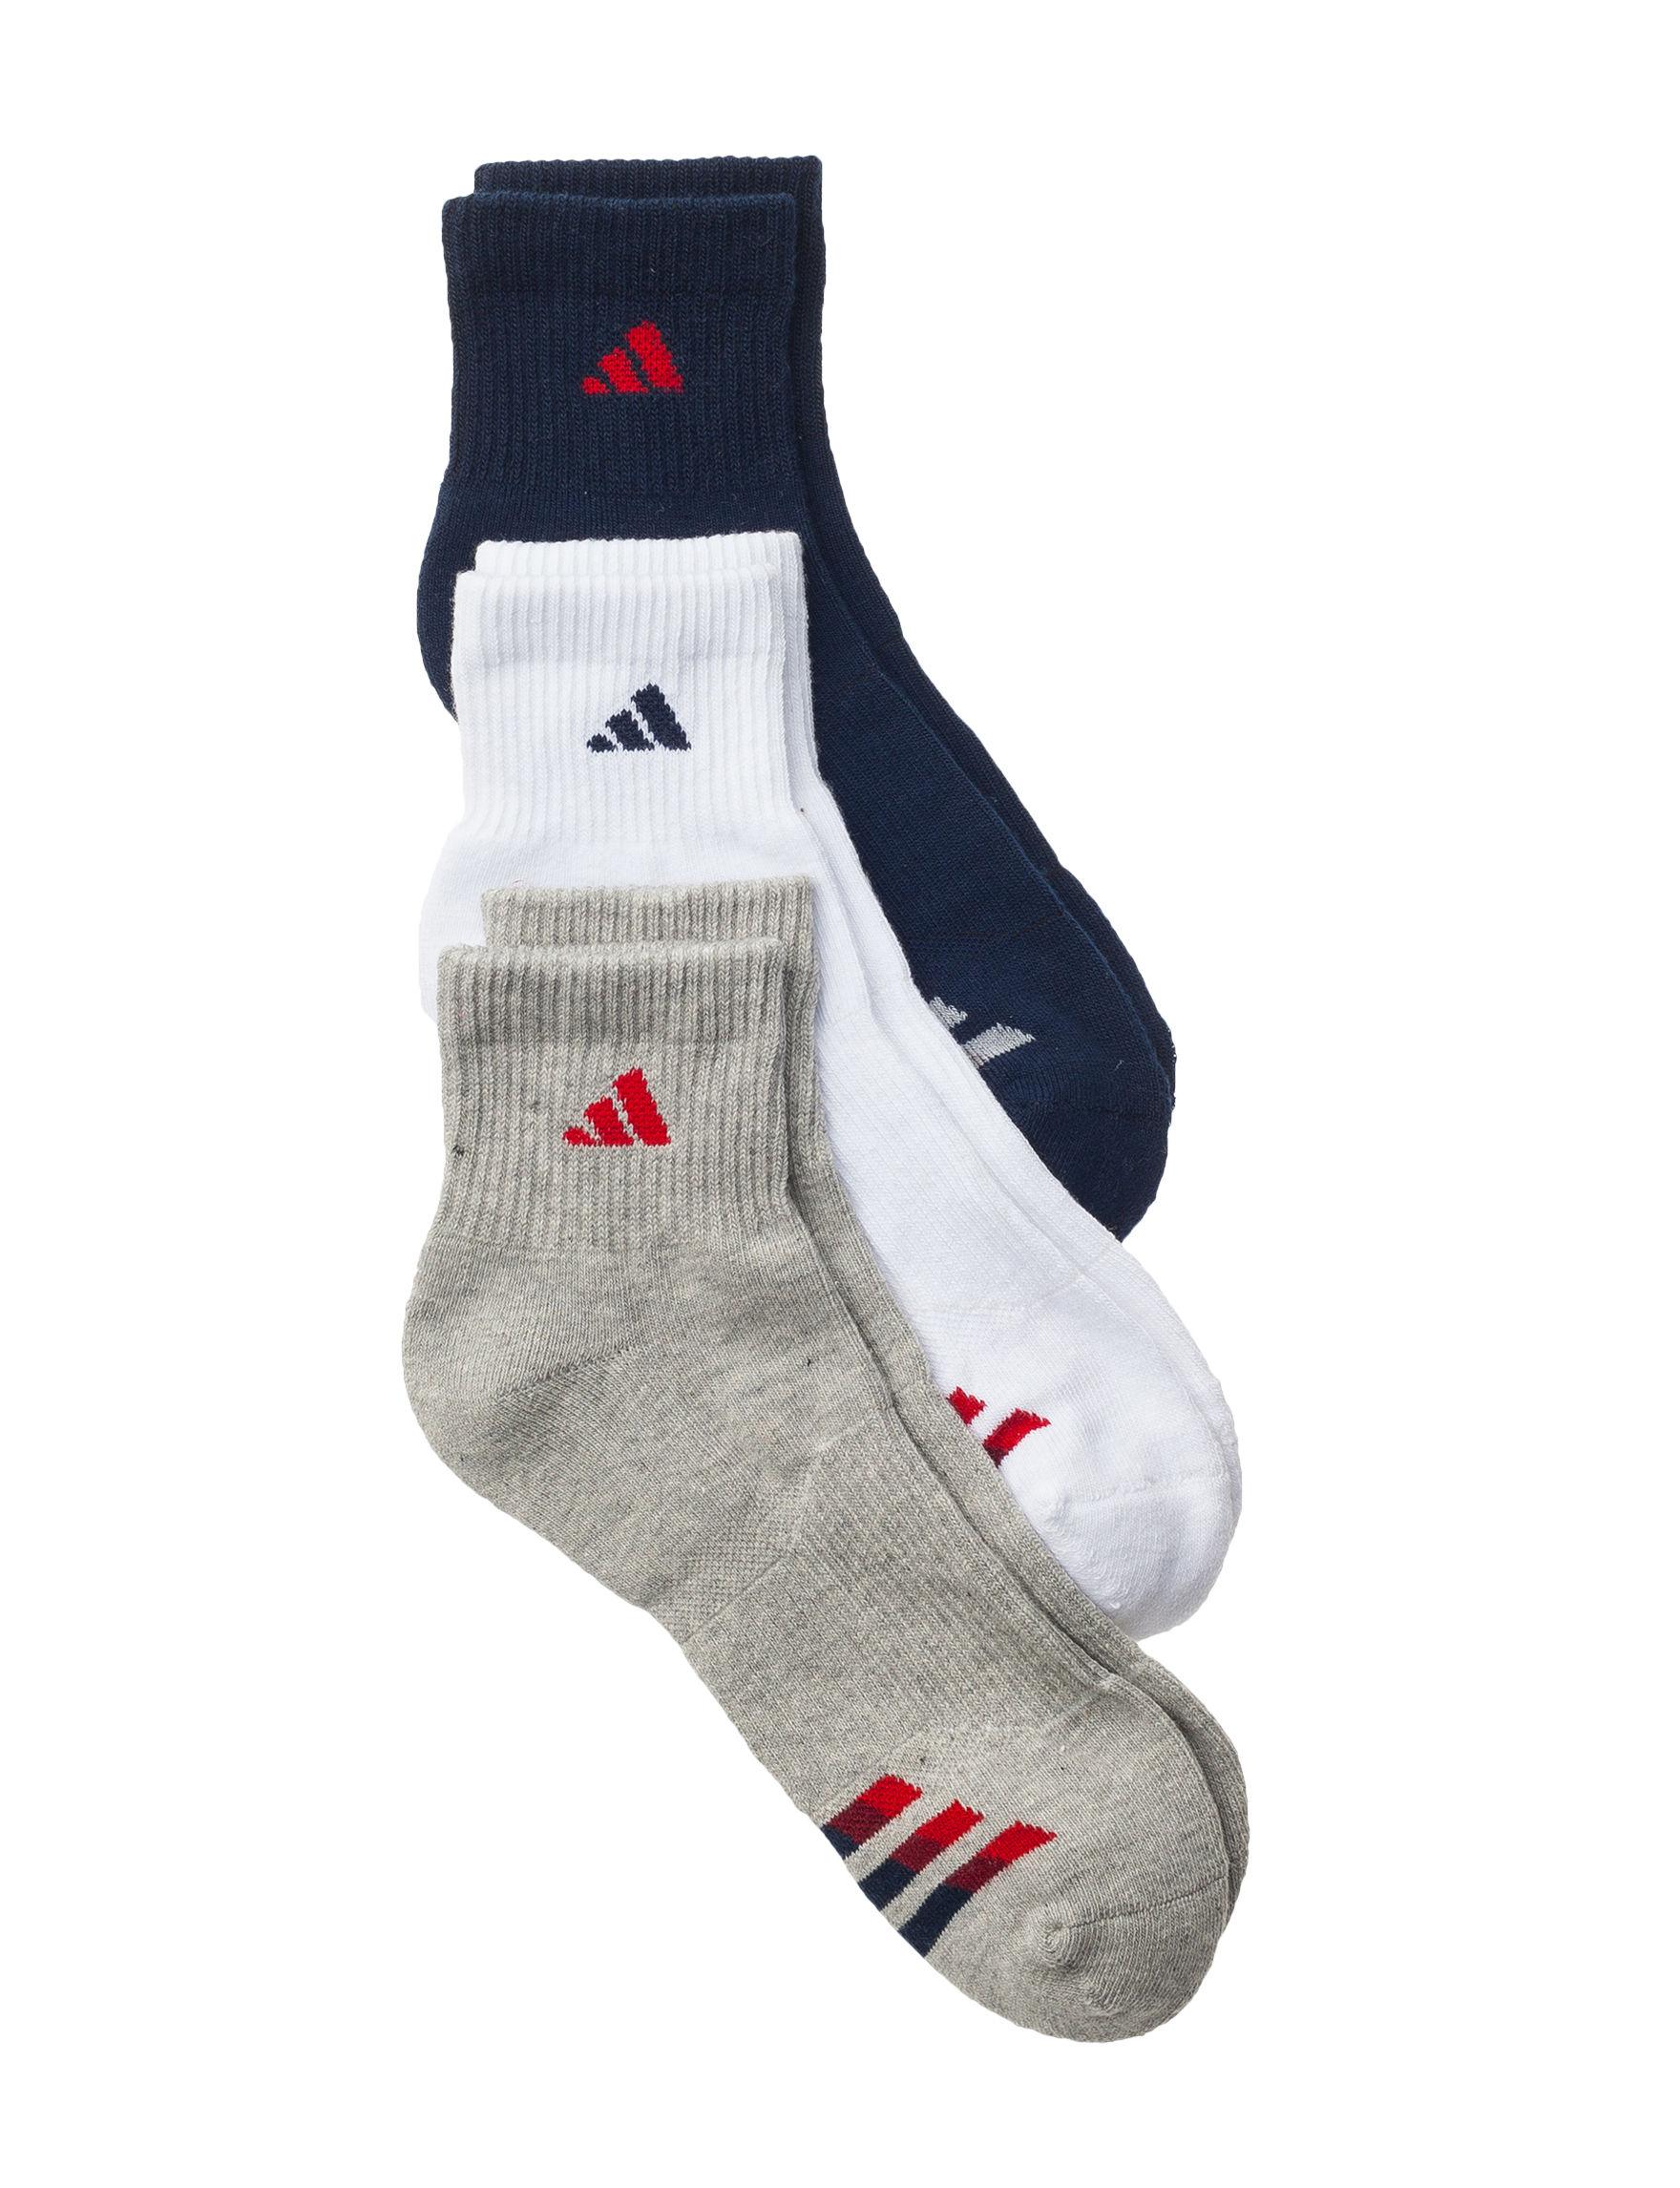 Adidas Navy Socks